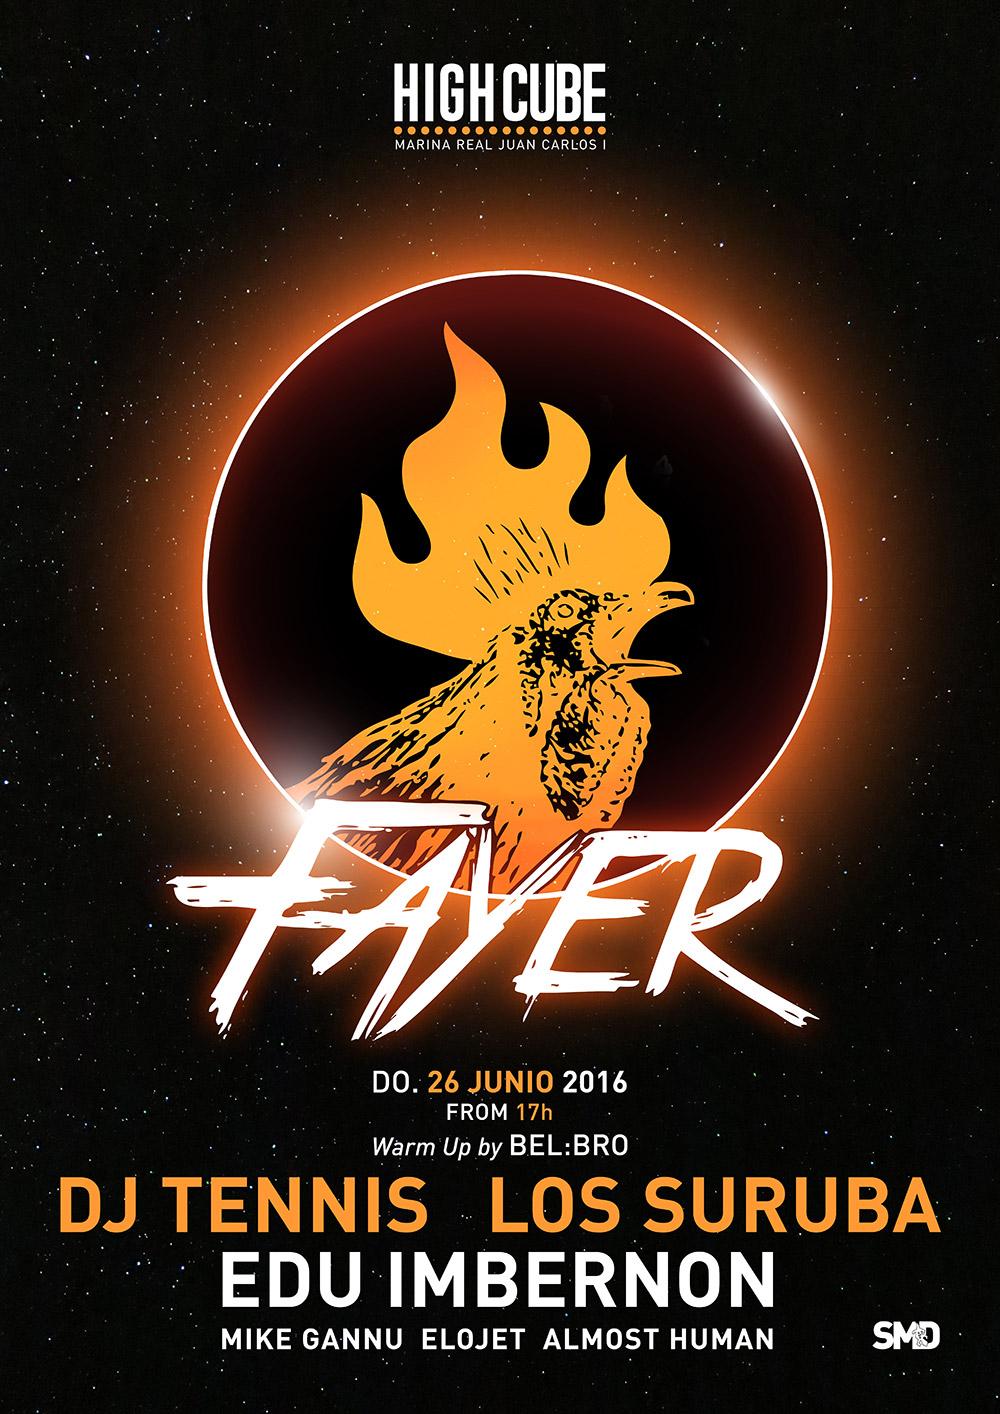 Fayer sunday 26 june 2016 with Los Suruba, Dj Tennis, Edu Imbernon, Mike Gannu, Almost Human and Elojet at High Cube Valencia